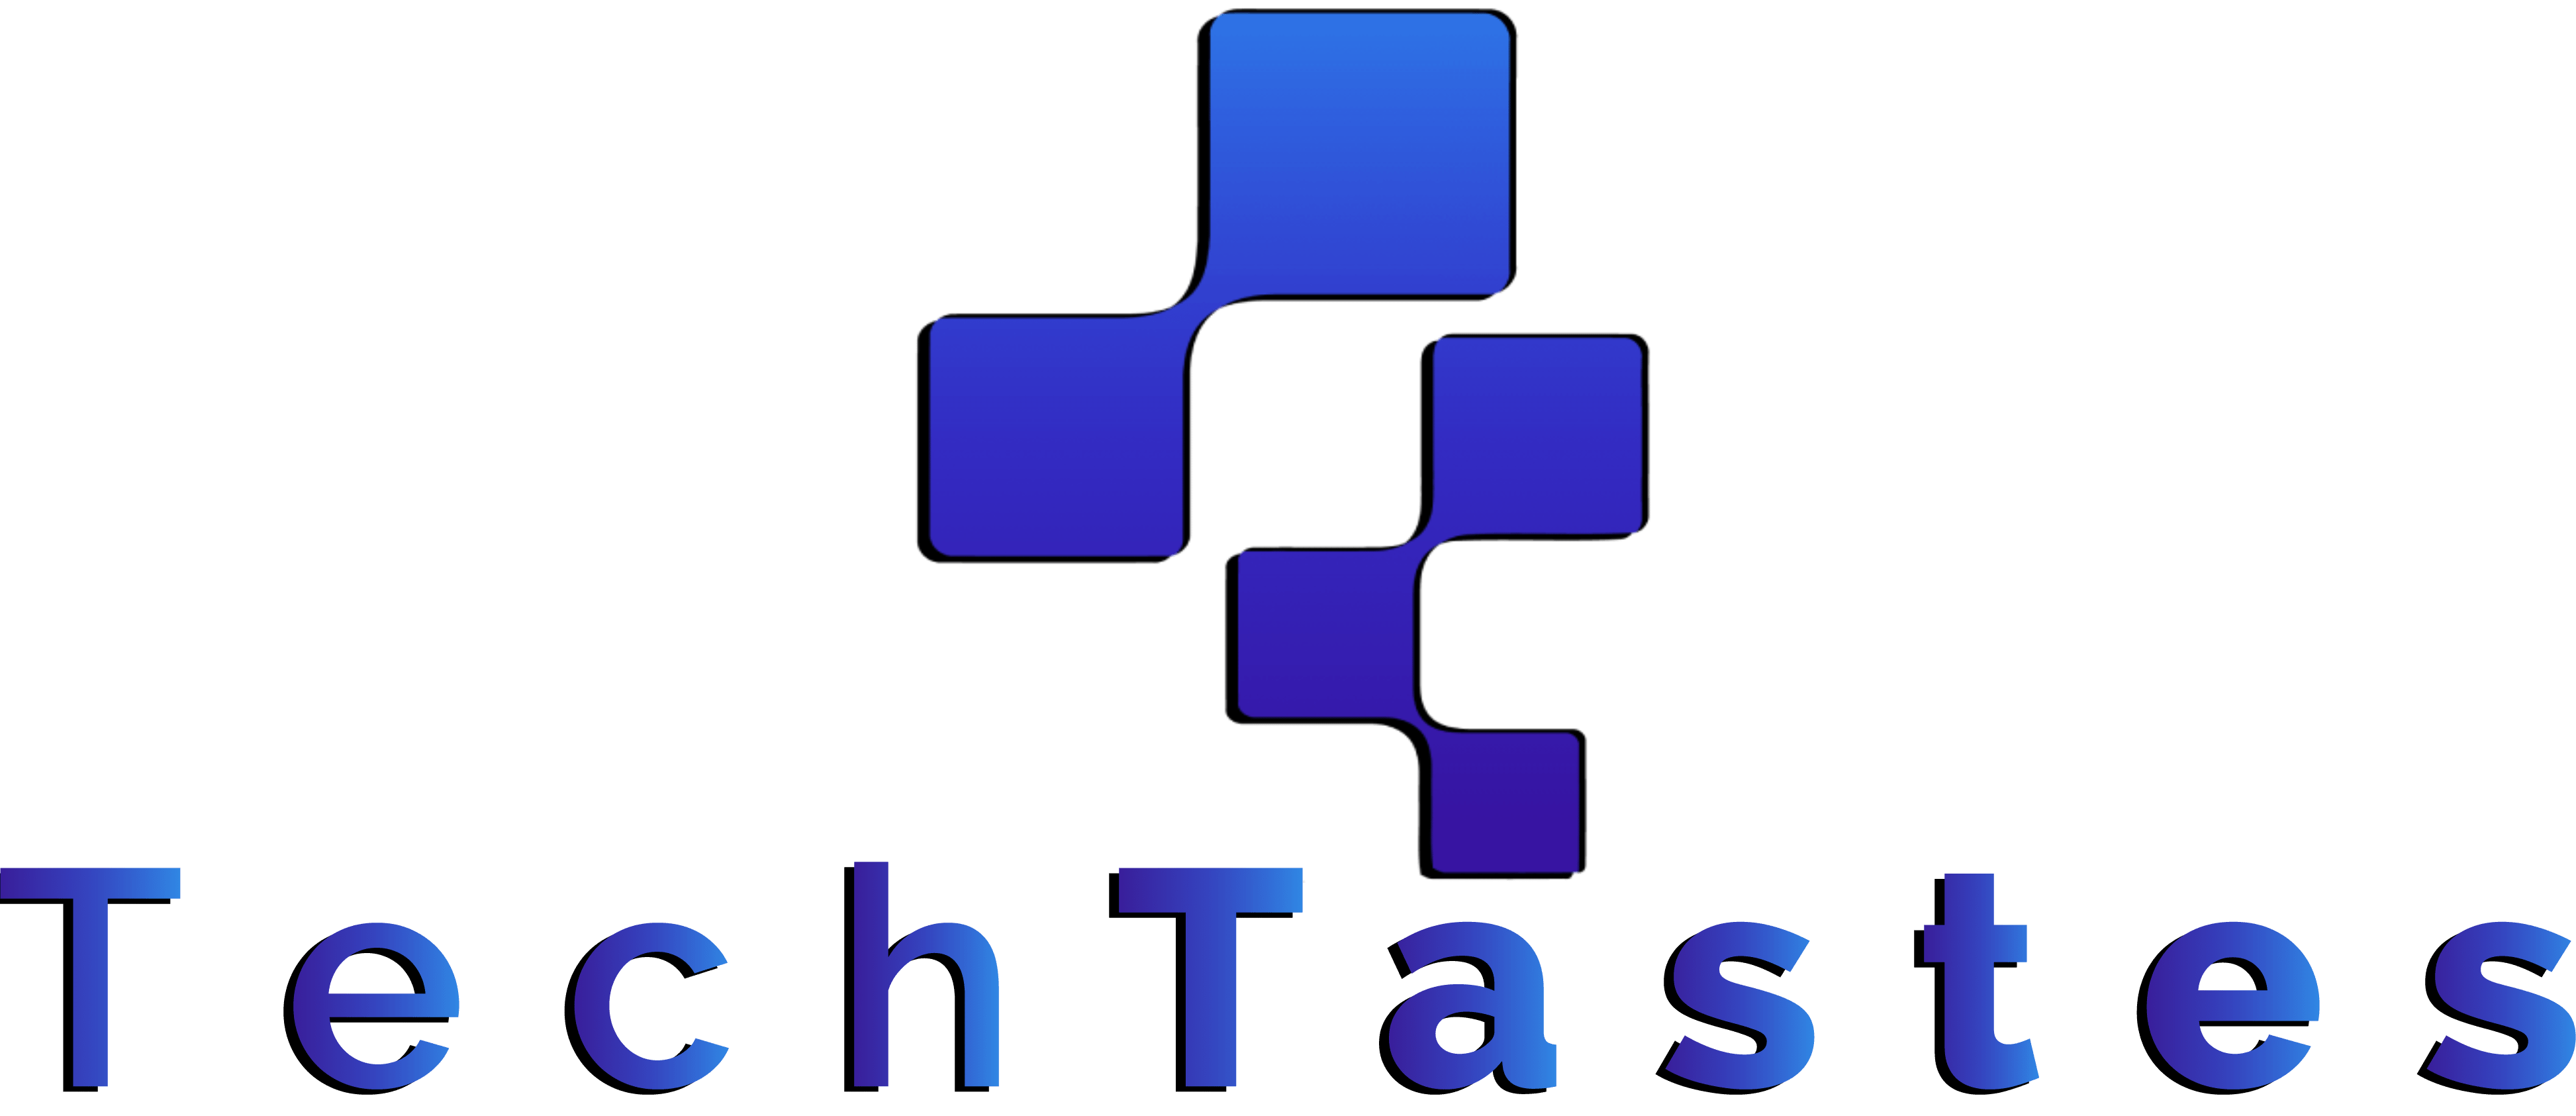 TechTastes